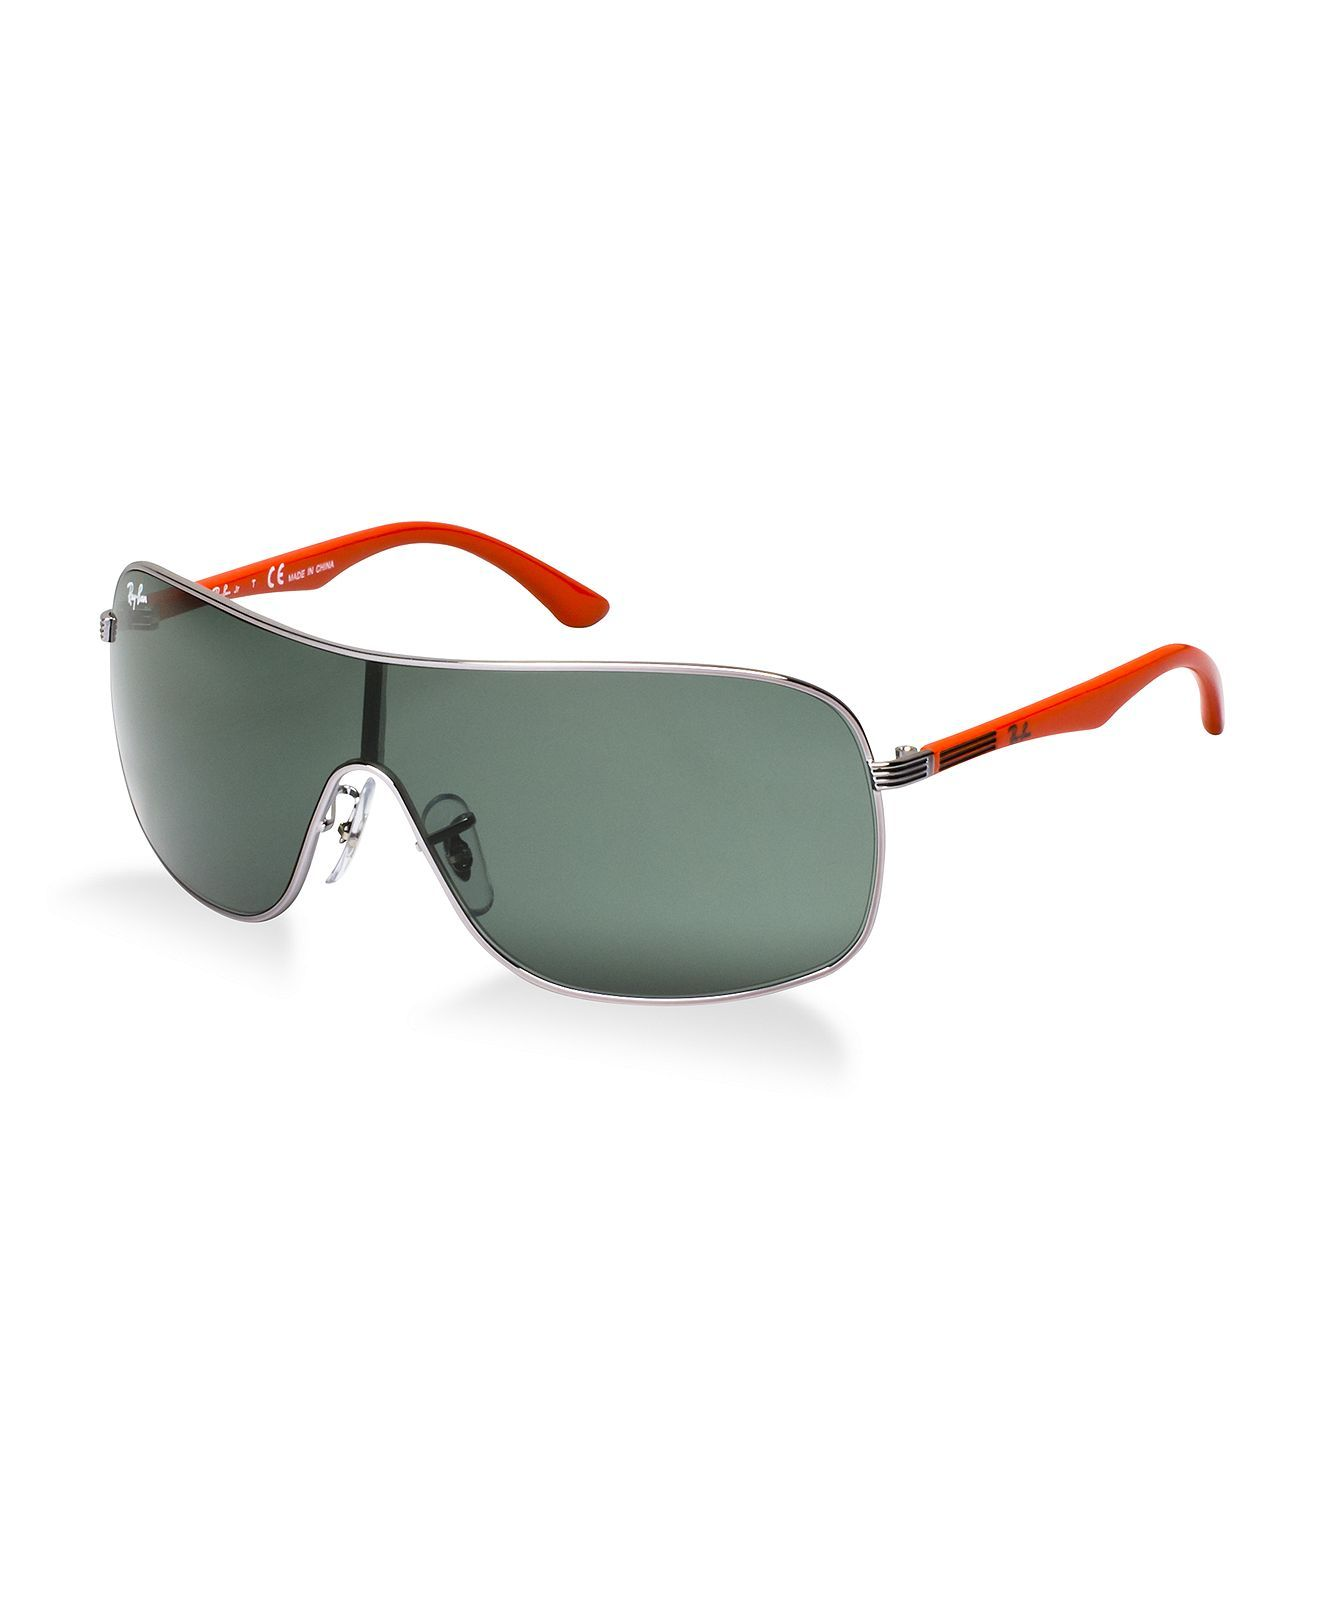 c4a4f42a95 ... good ray ban jr. sunglasses rj9530s mens sunglasses macys a66d2 3ae75